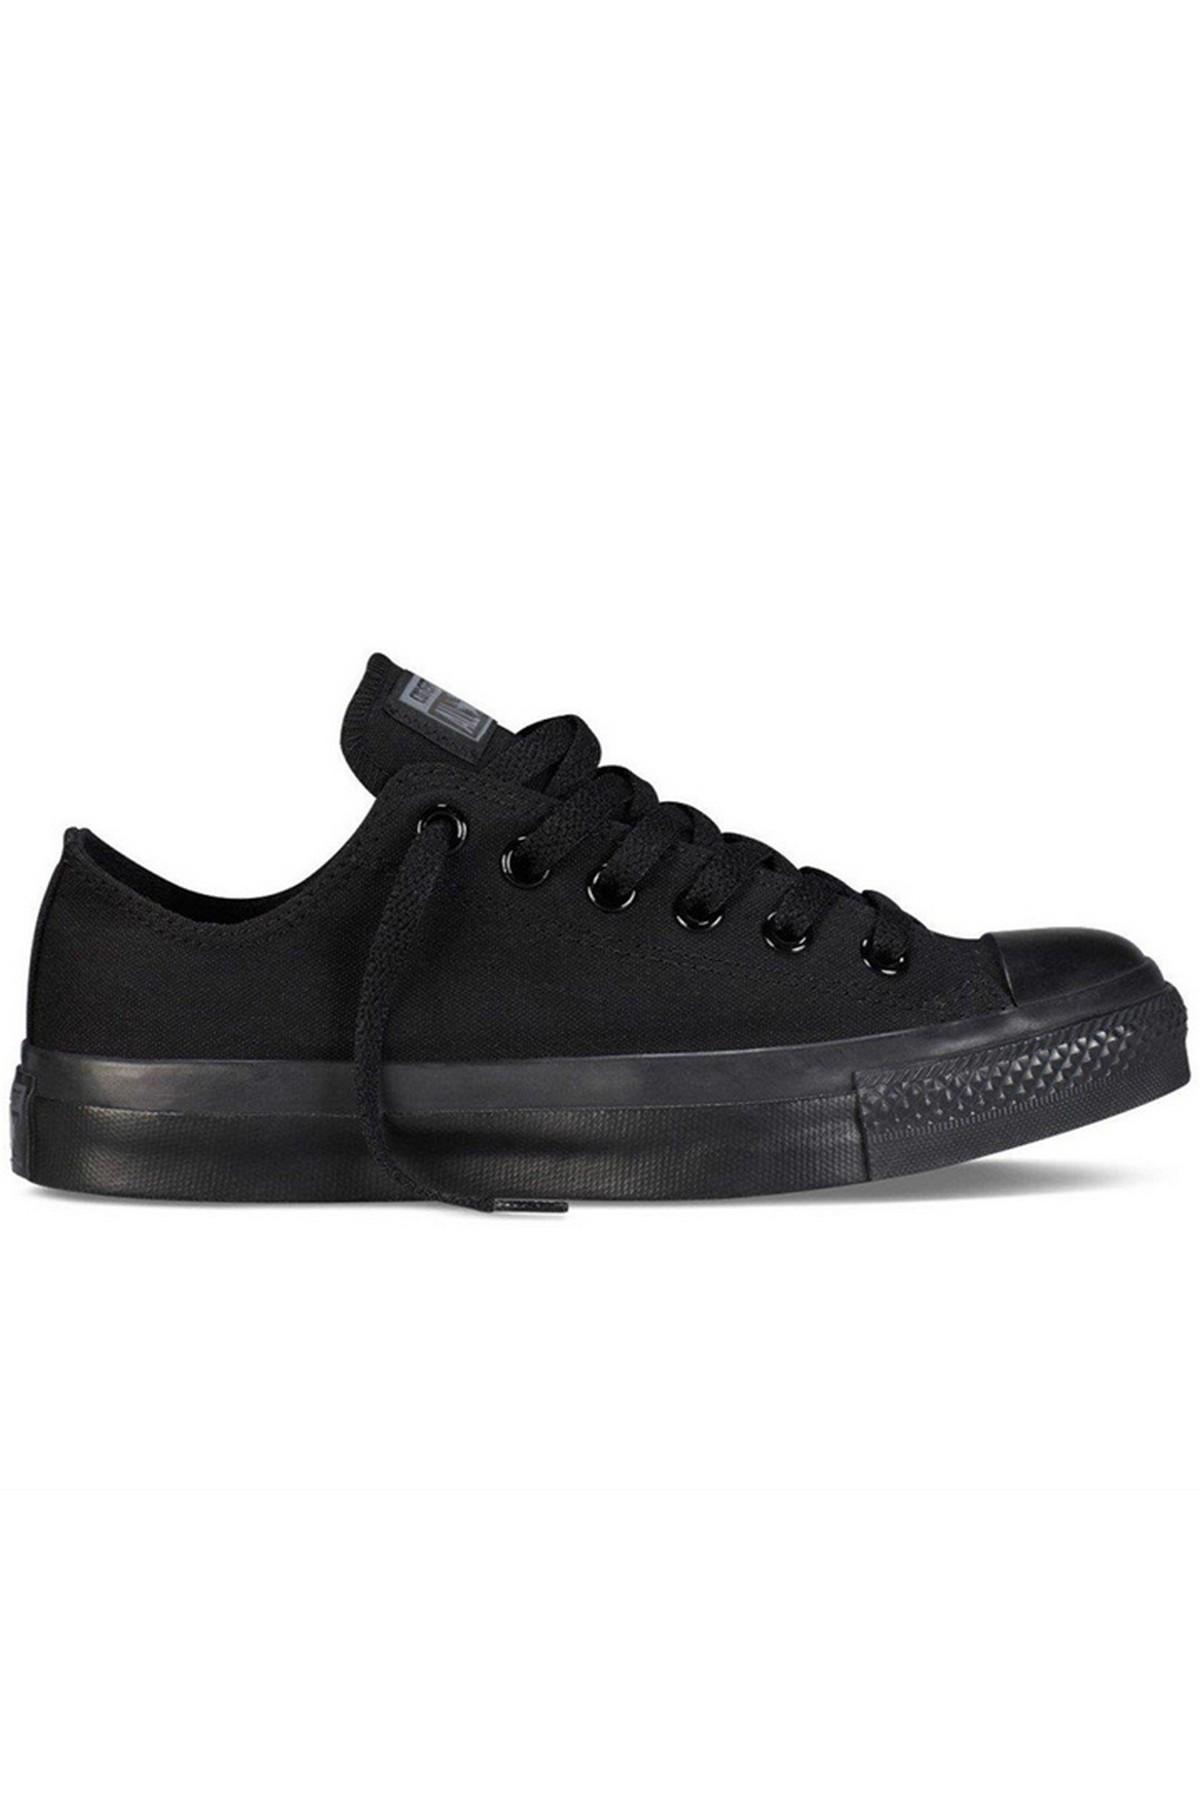 Converse Chuck Taylor All Star Siyah Sneaker (M5039C)